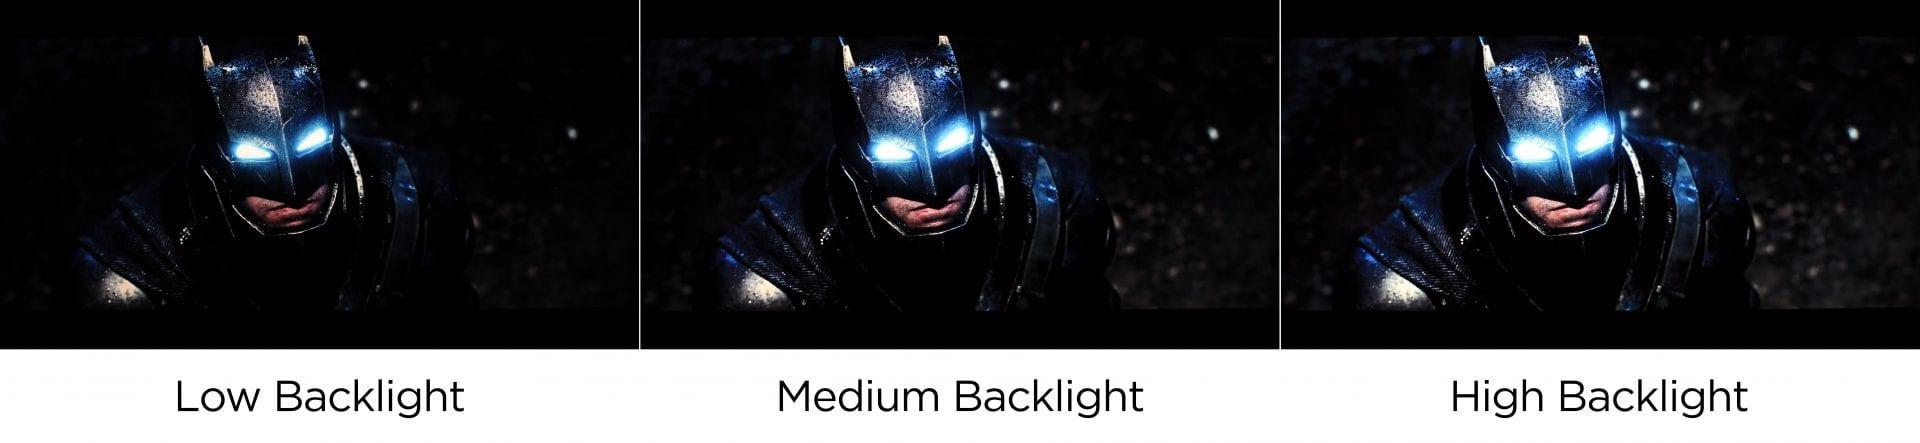 backlight  best tv picture settings